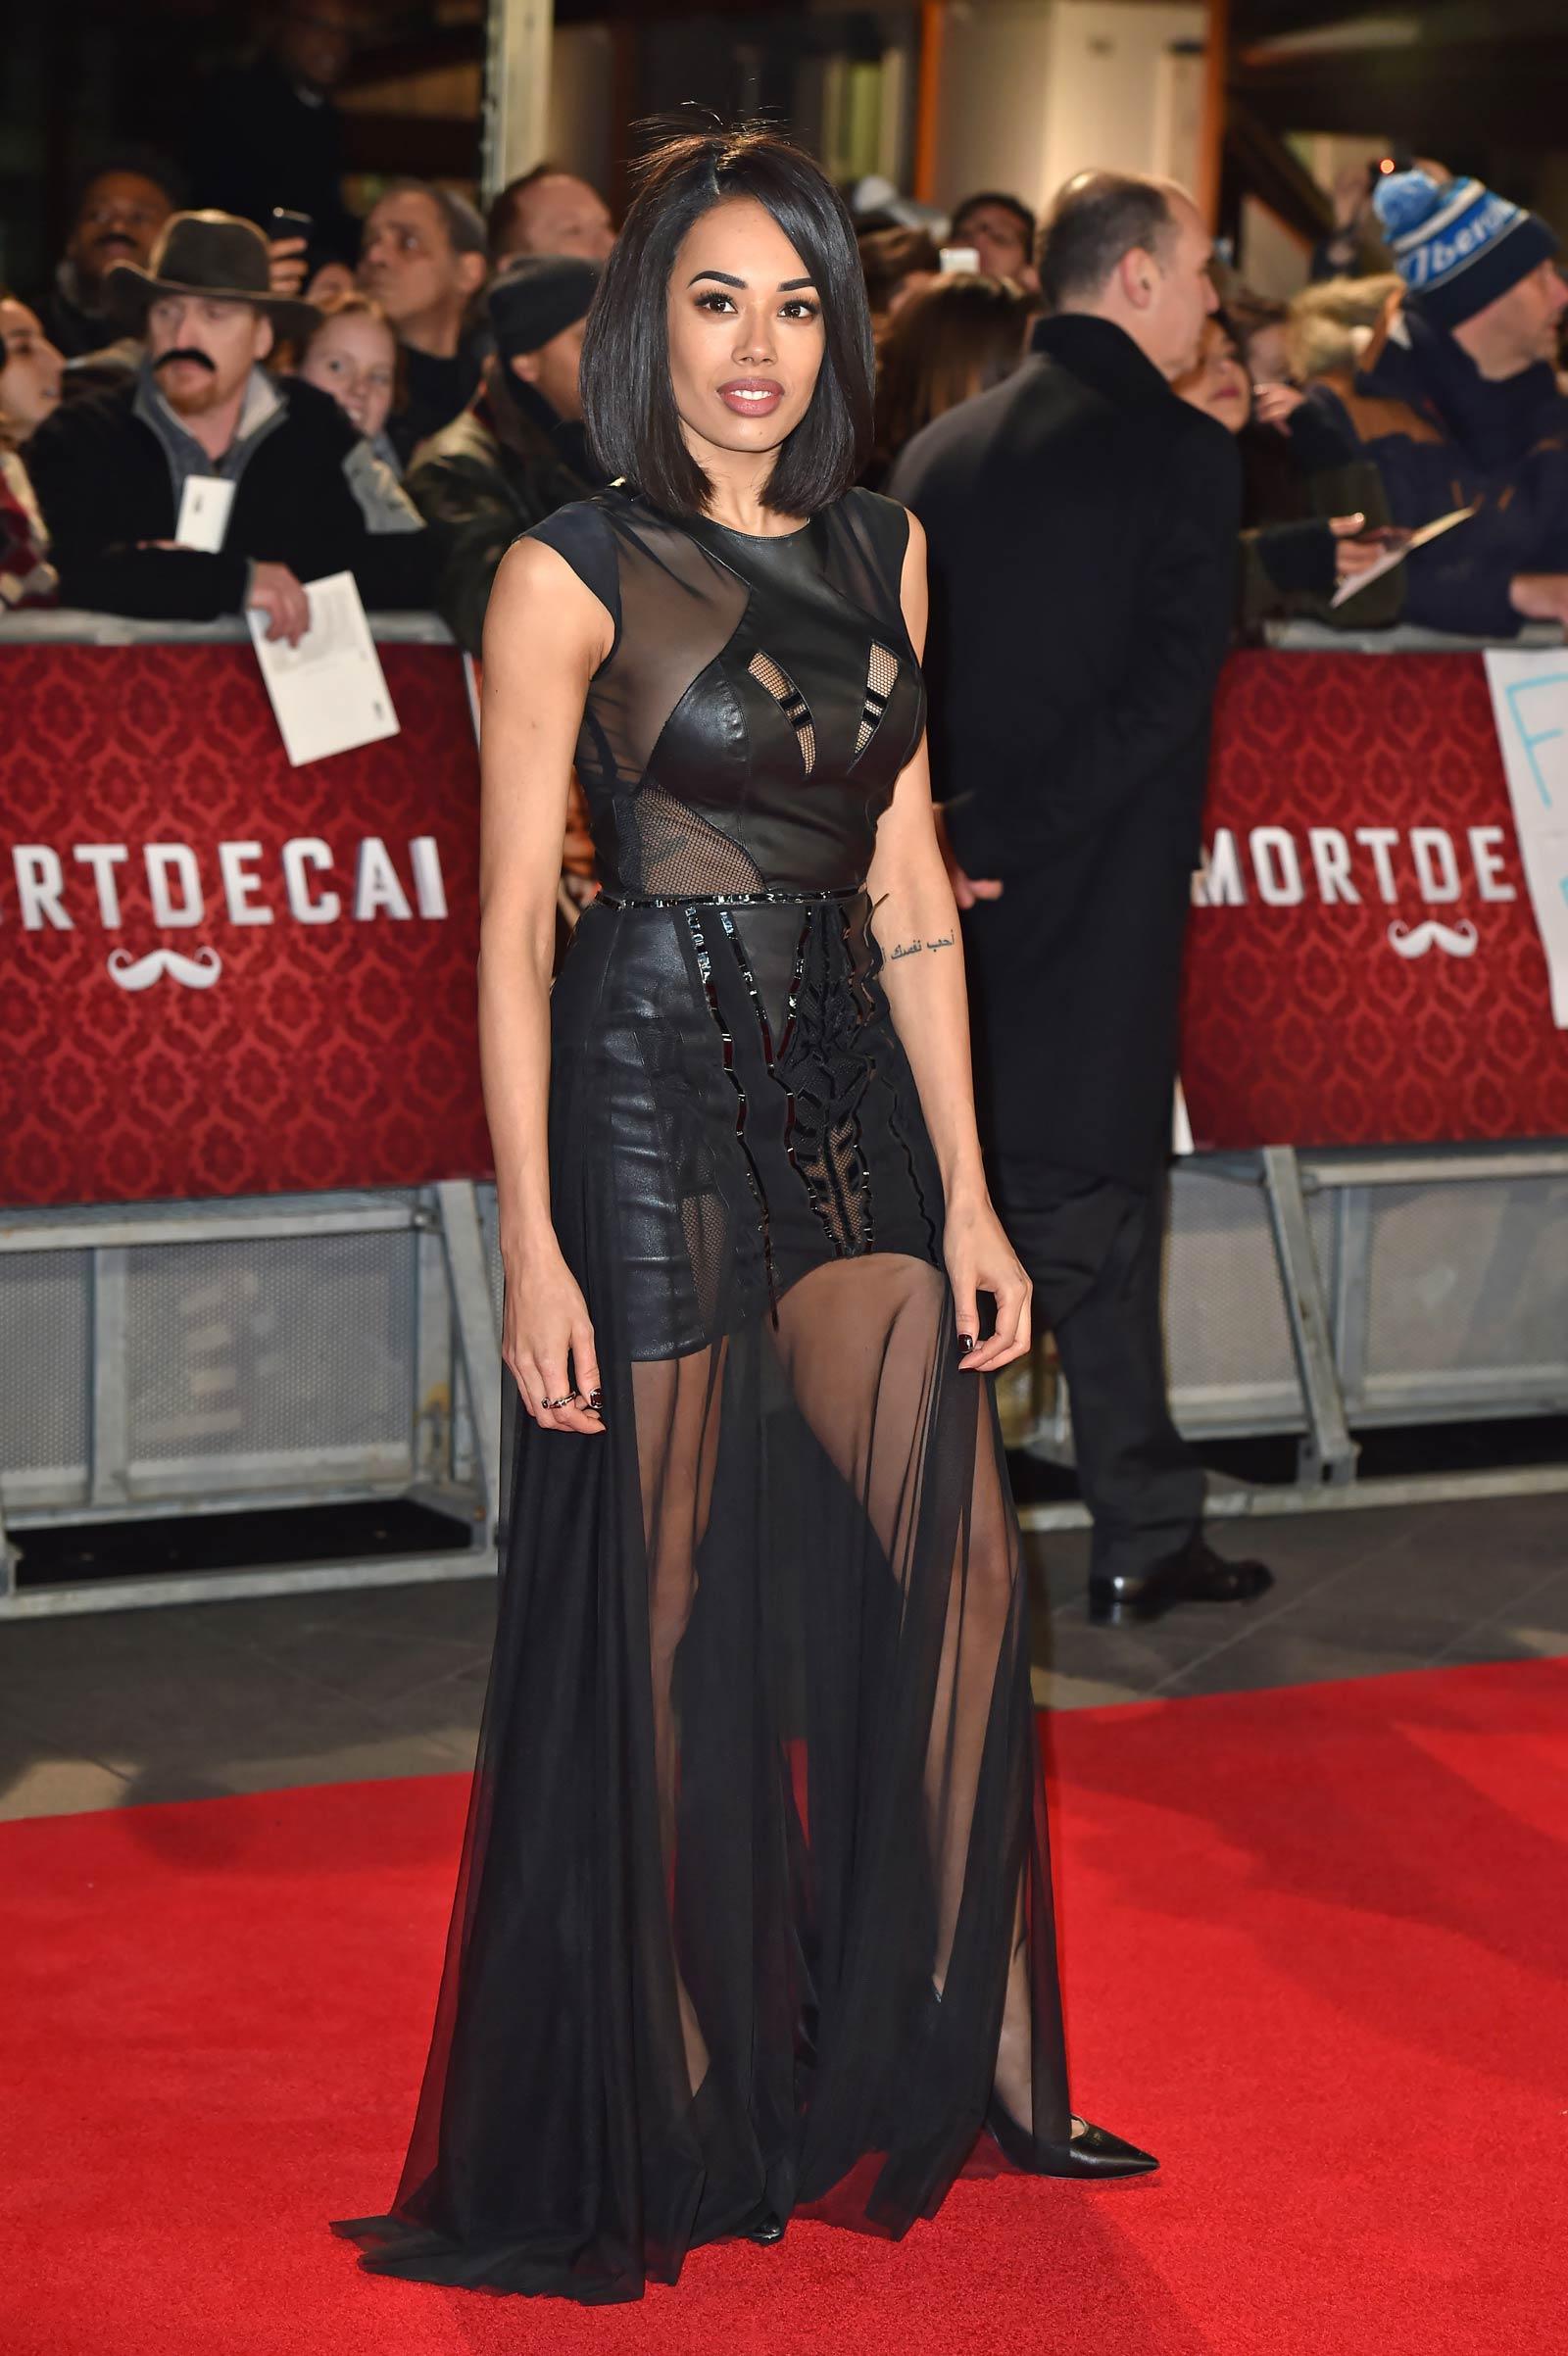 Jade Ewen attends Mortdecai London premiere